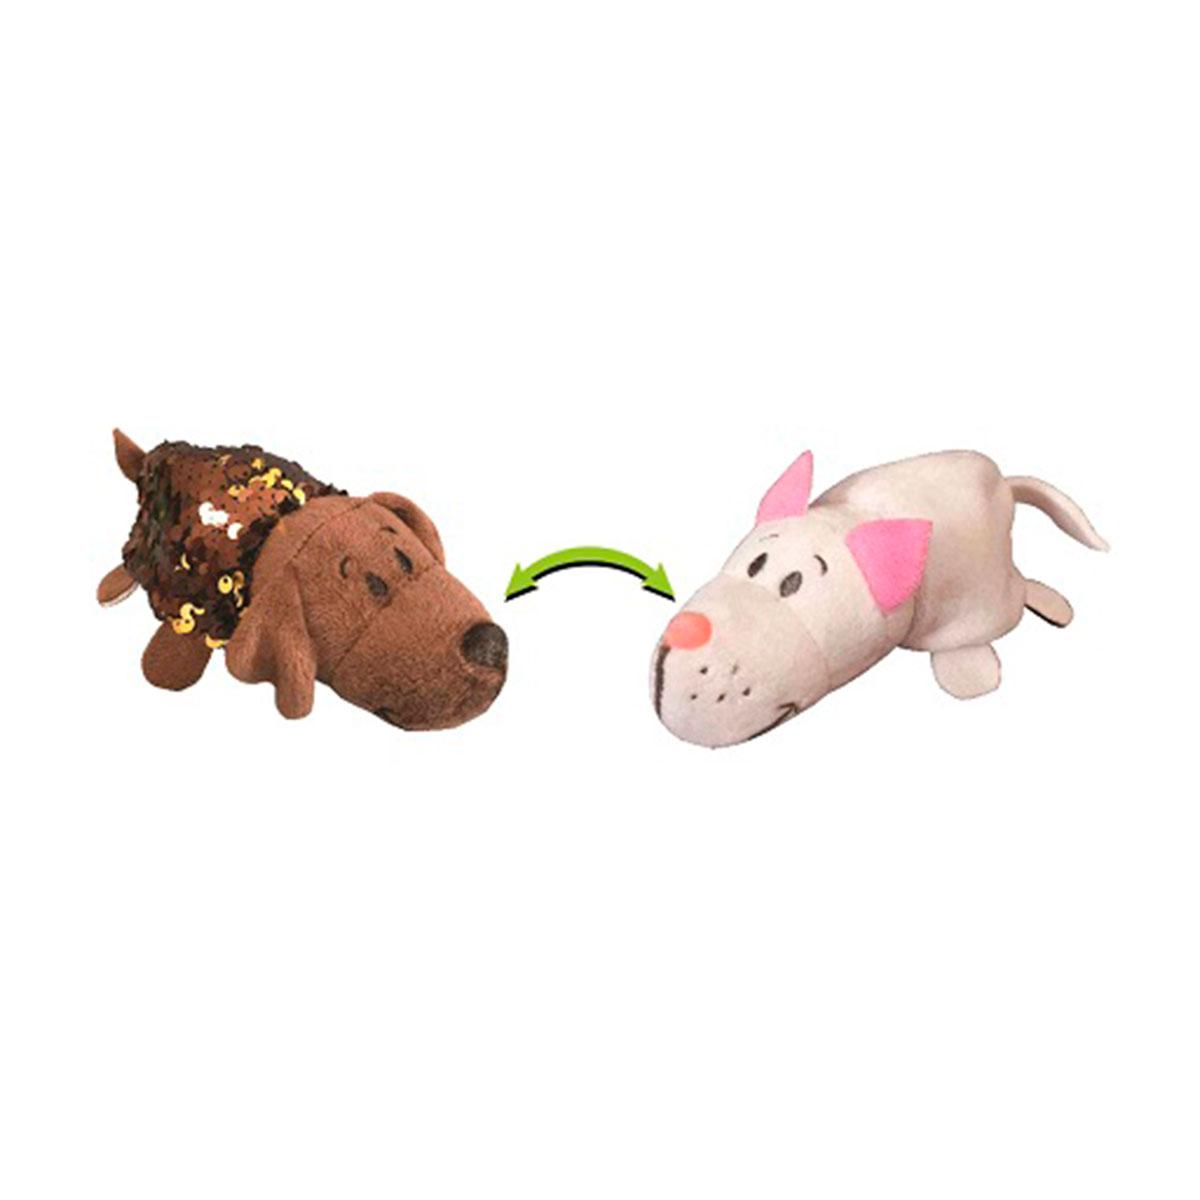 Мягкая игрушка с пайетками 2 в 1 - ZooPrяtki - ЛАБРАДОР-КОТ (12 cm), 554IT-ZPR